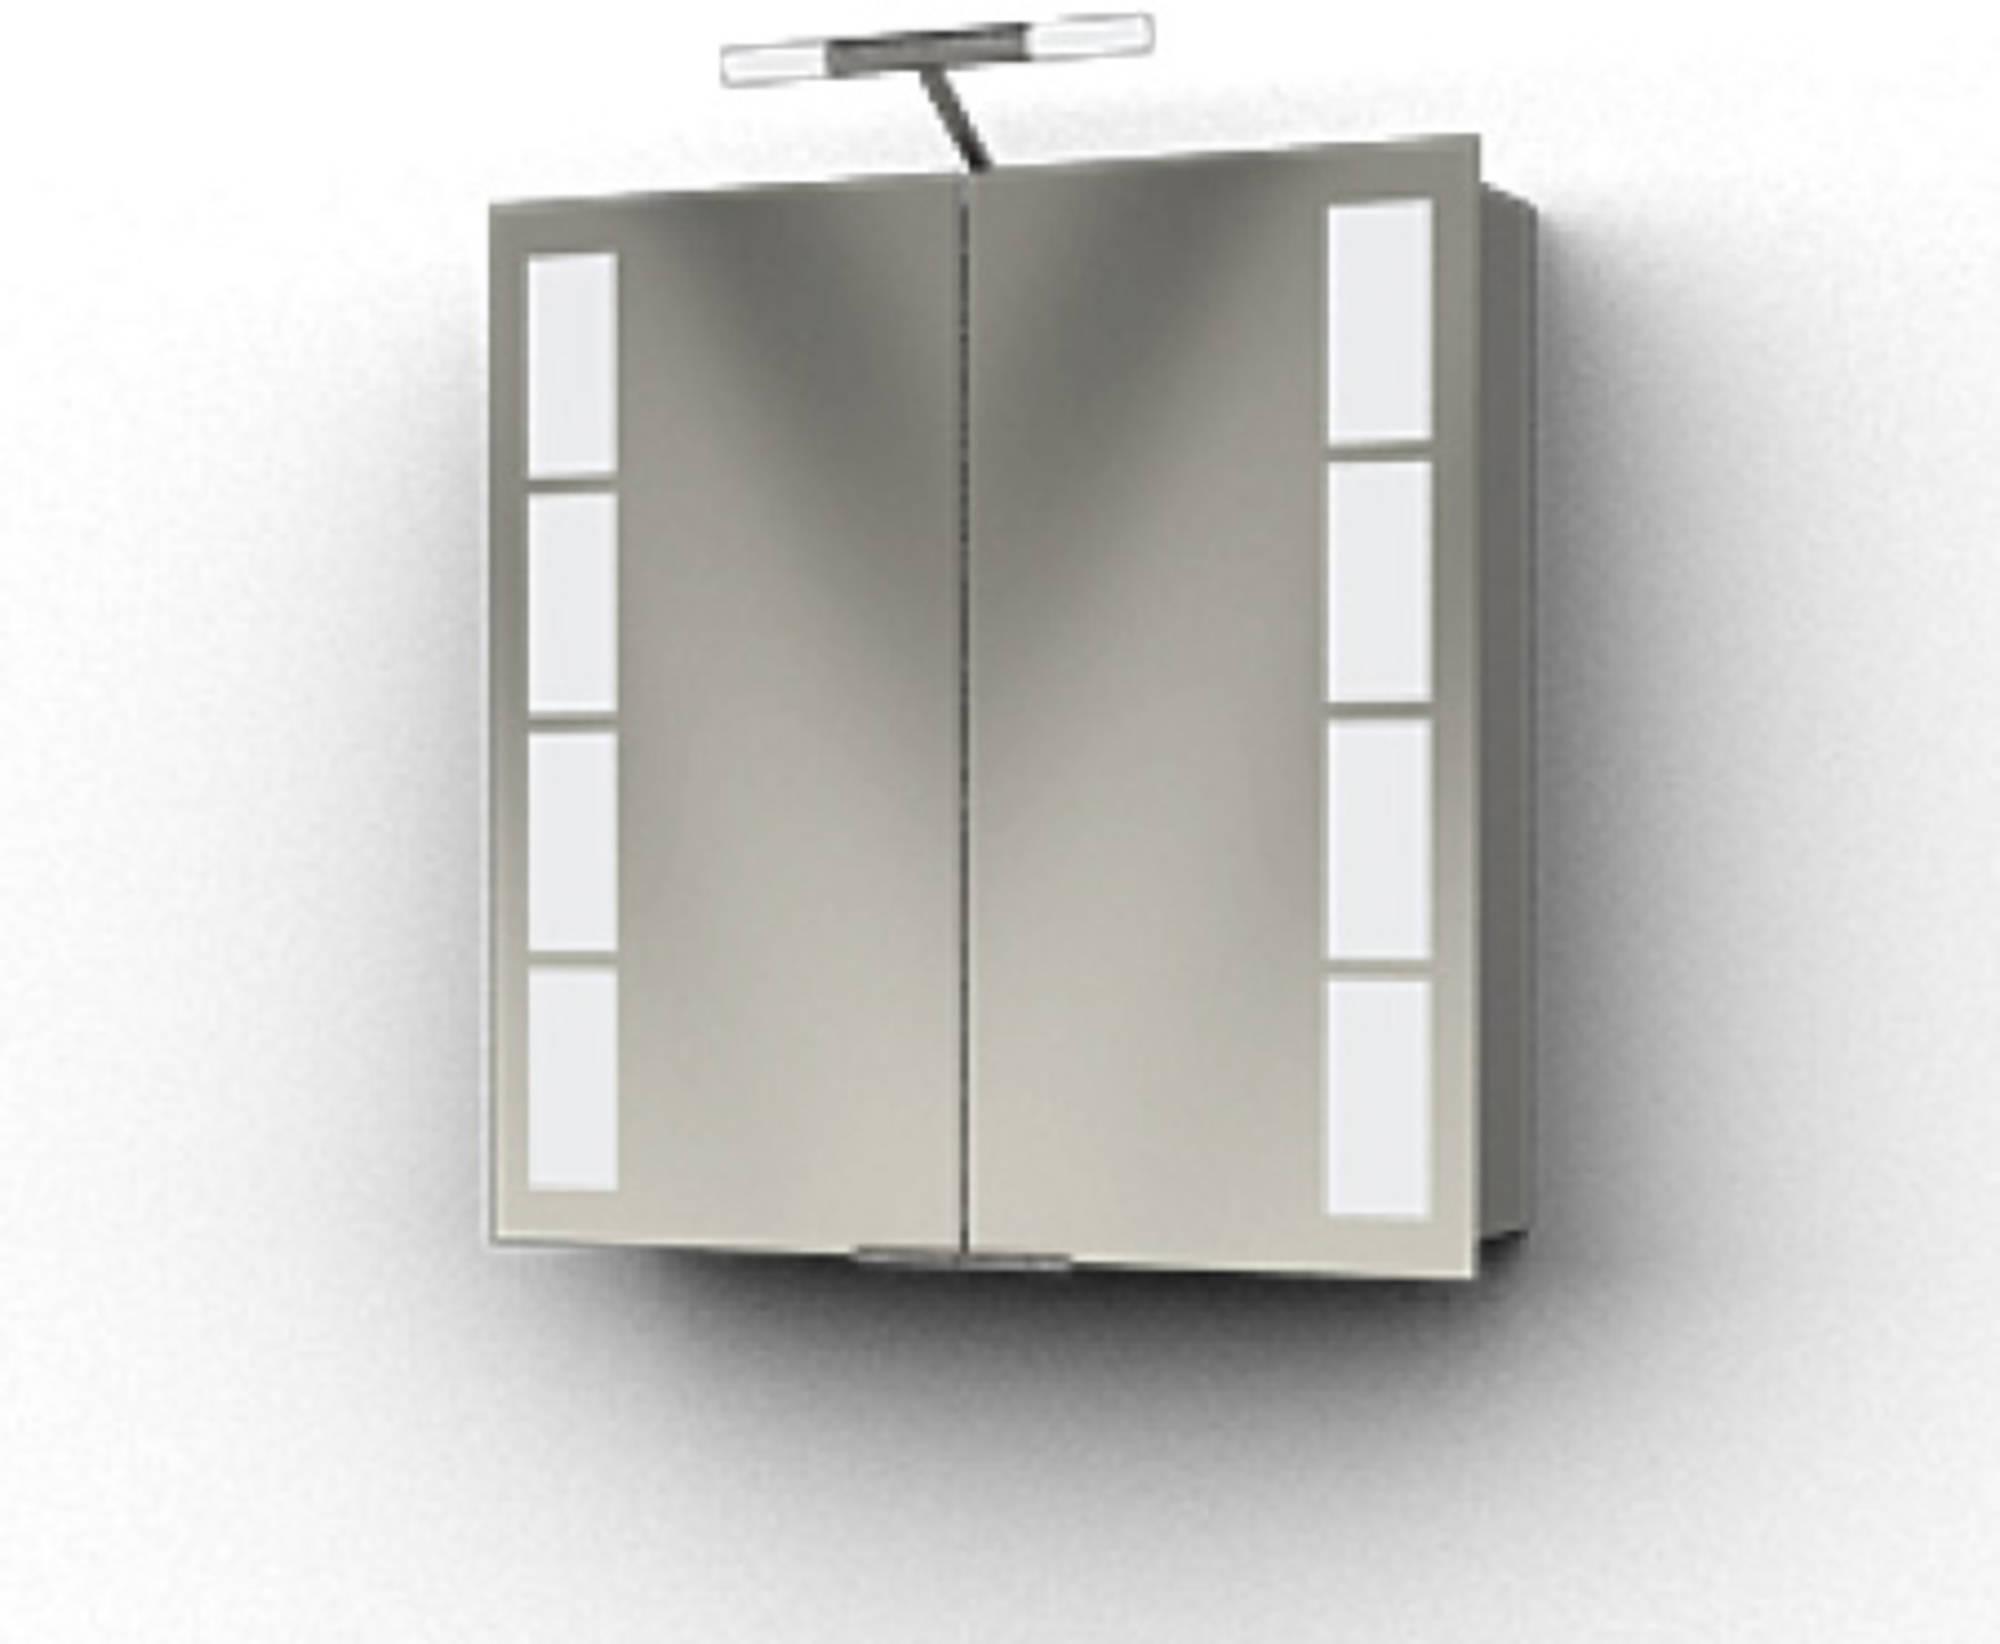 Ben Magno Spiegelkast Aluminium 75cm met staafverlichting